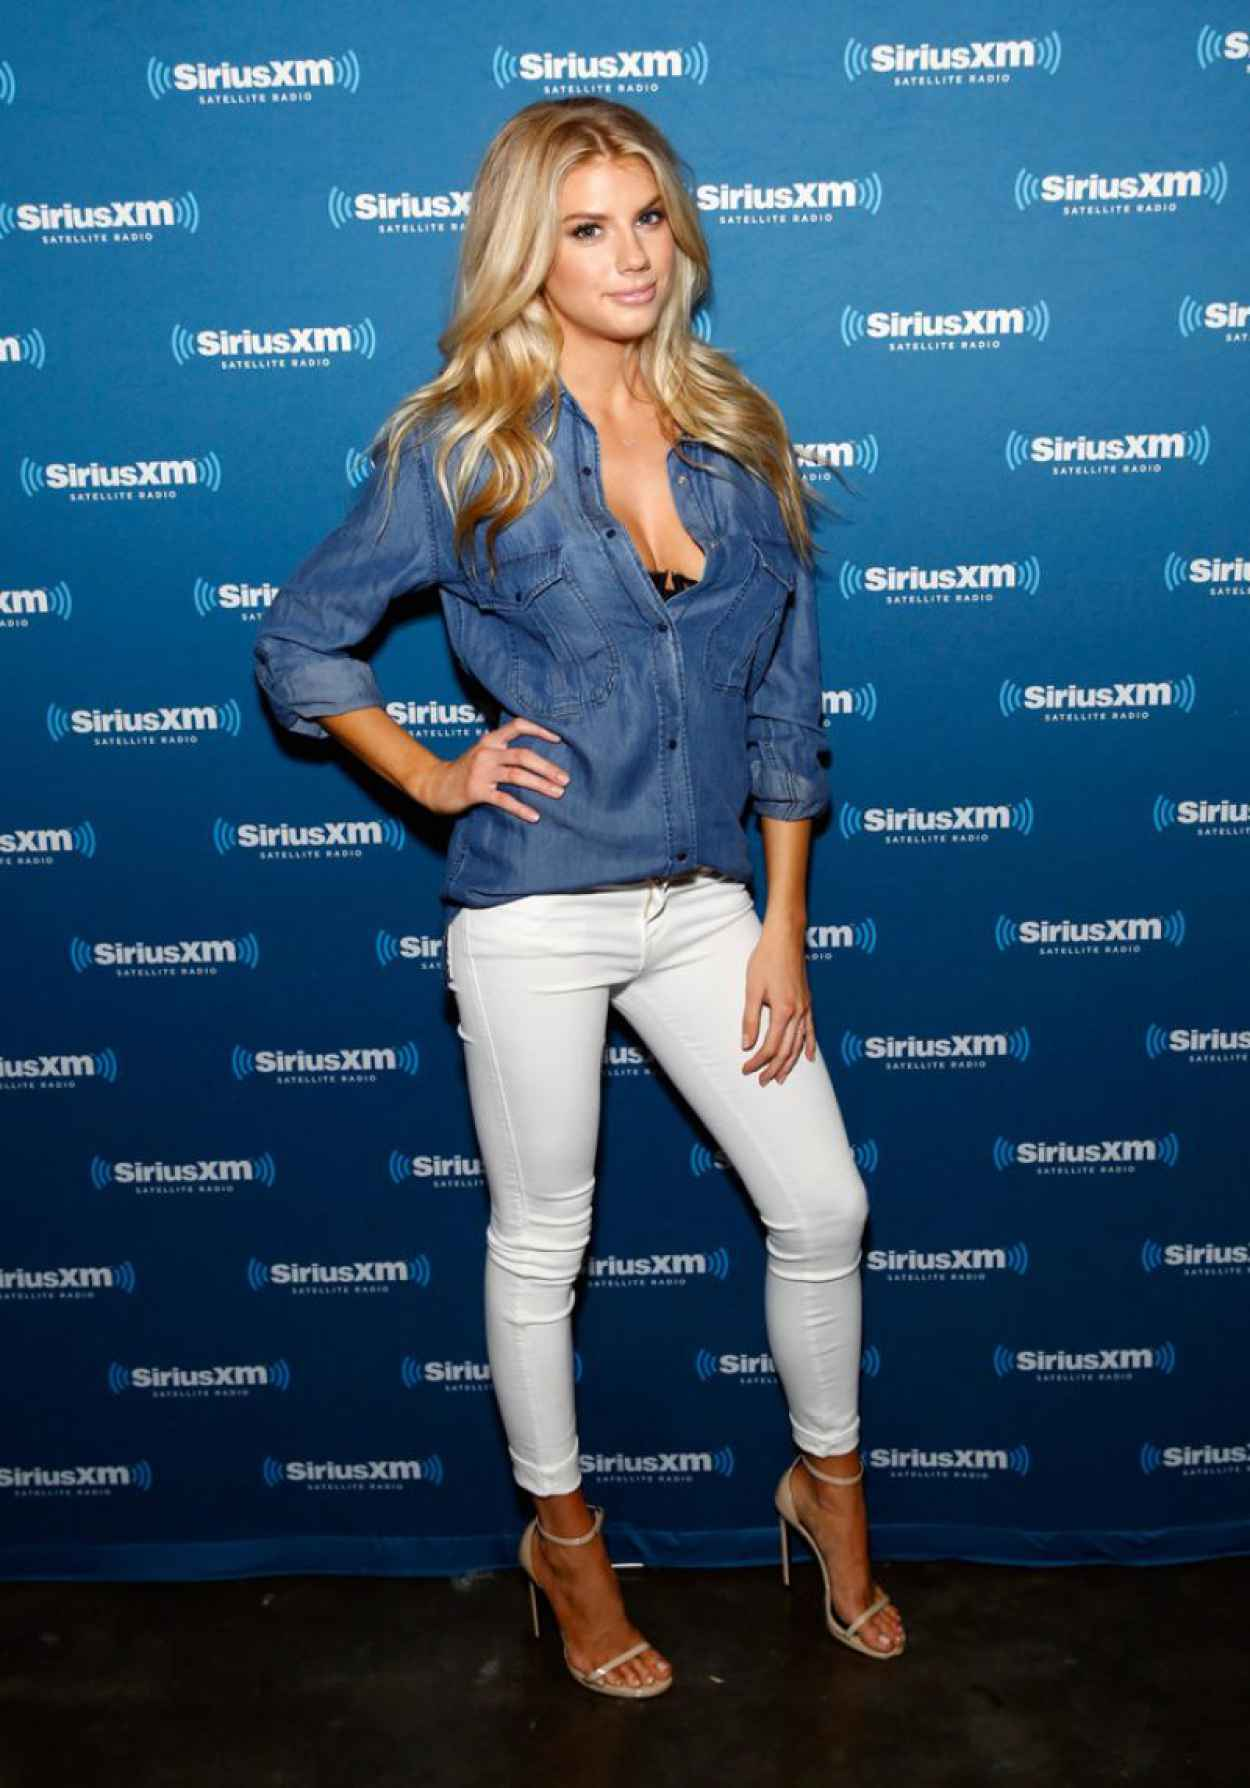 Charlotte McKinney - SiriusXM at Super Bowl XLIX Radio Row in Phoenix, January 2015-1